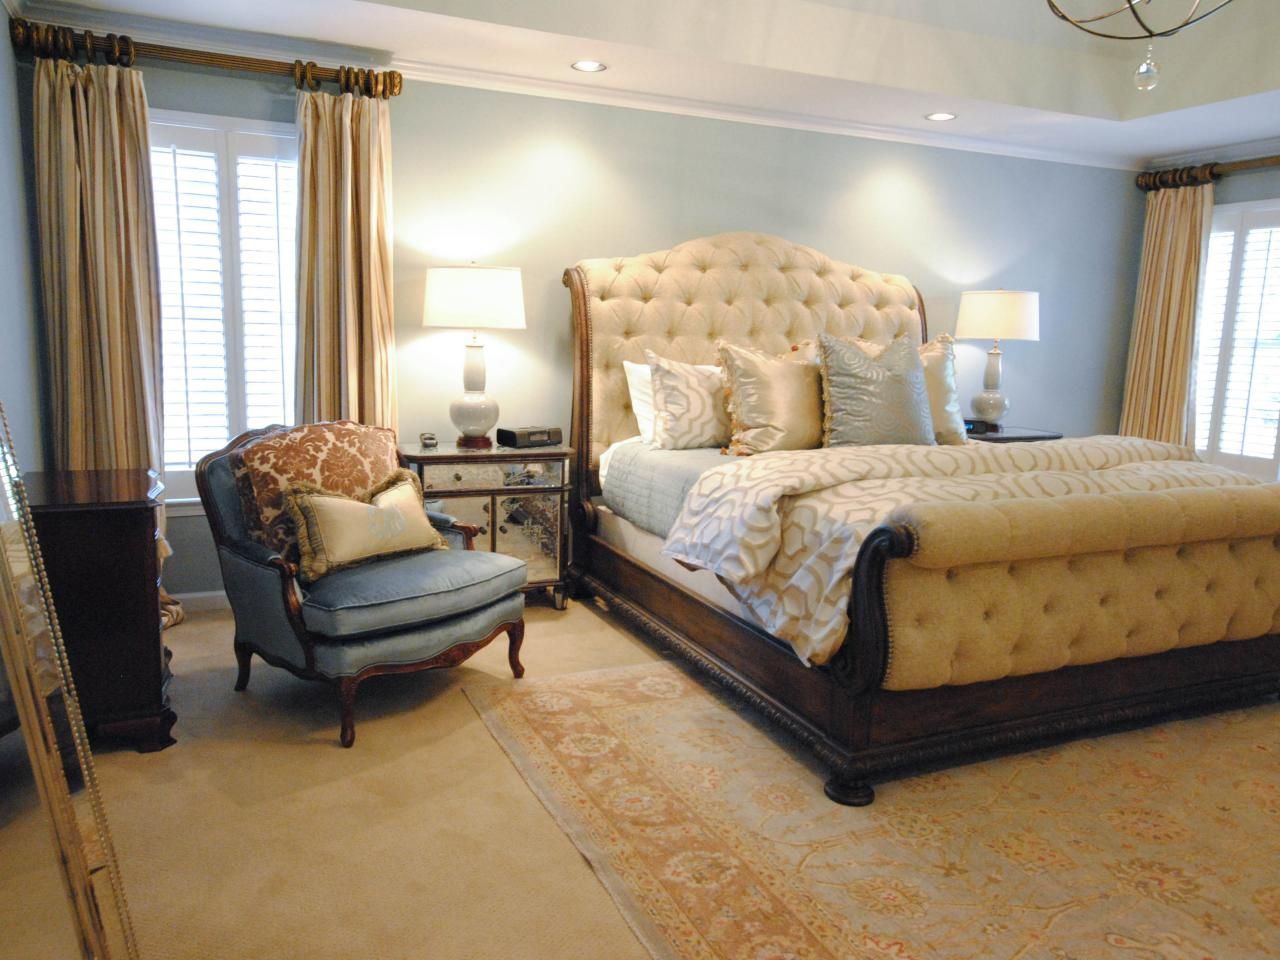 Master bedroom furniture ideas  Simple Hot Chocolate Three Ways  Master bedroom Hgtv and Bedrooms